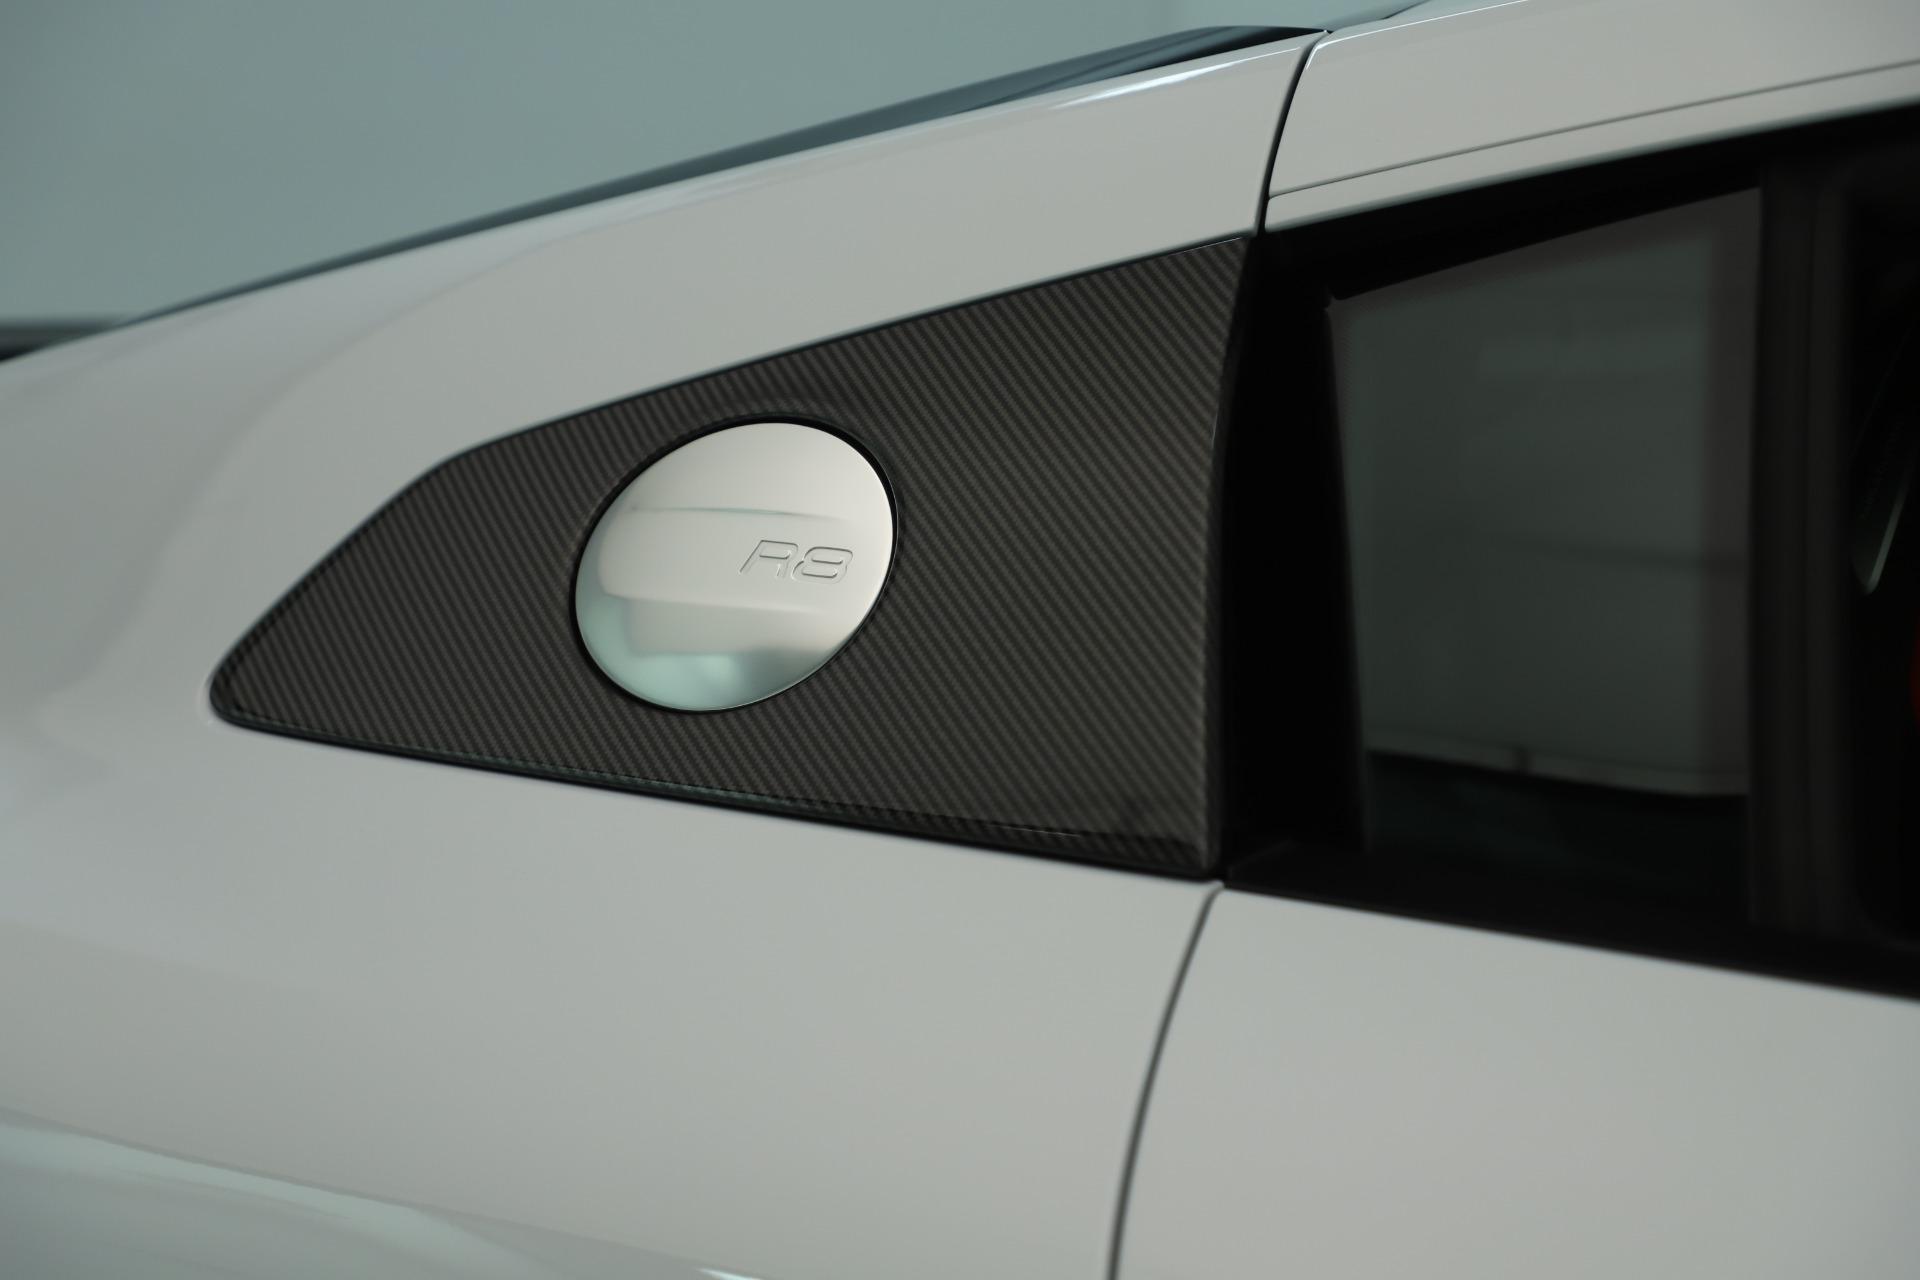 Used 2018 Audi R8 5.2 quattro V10 Plus For Sale In Greenwich, CT 3360_p25